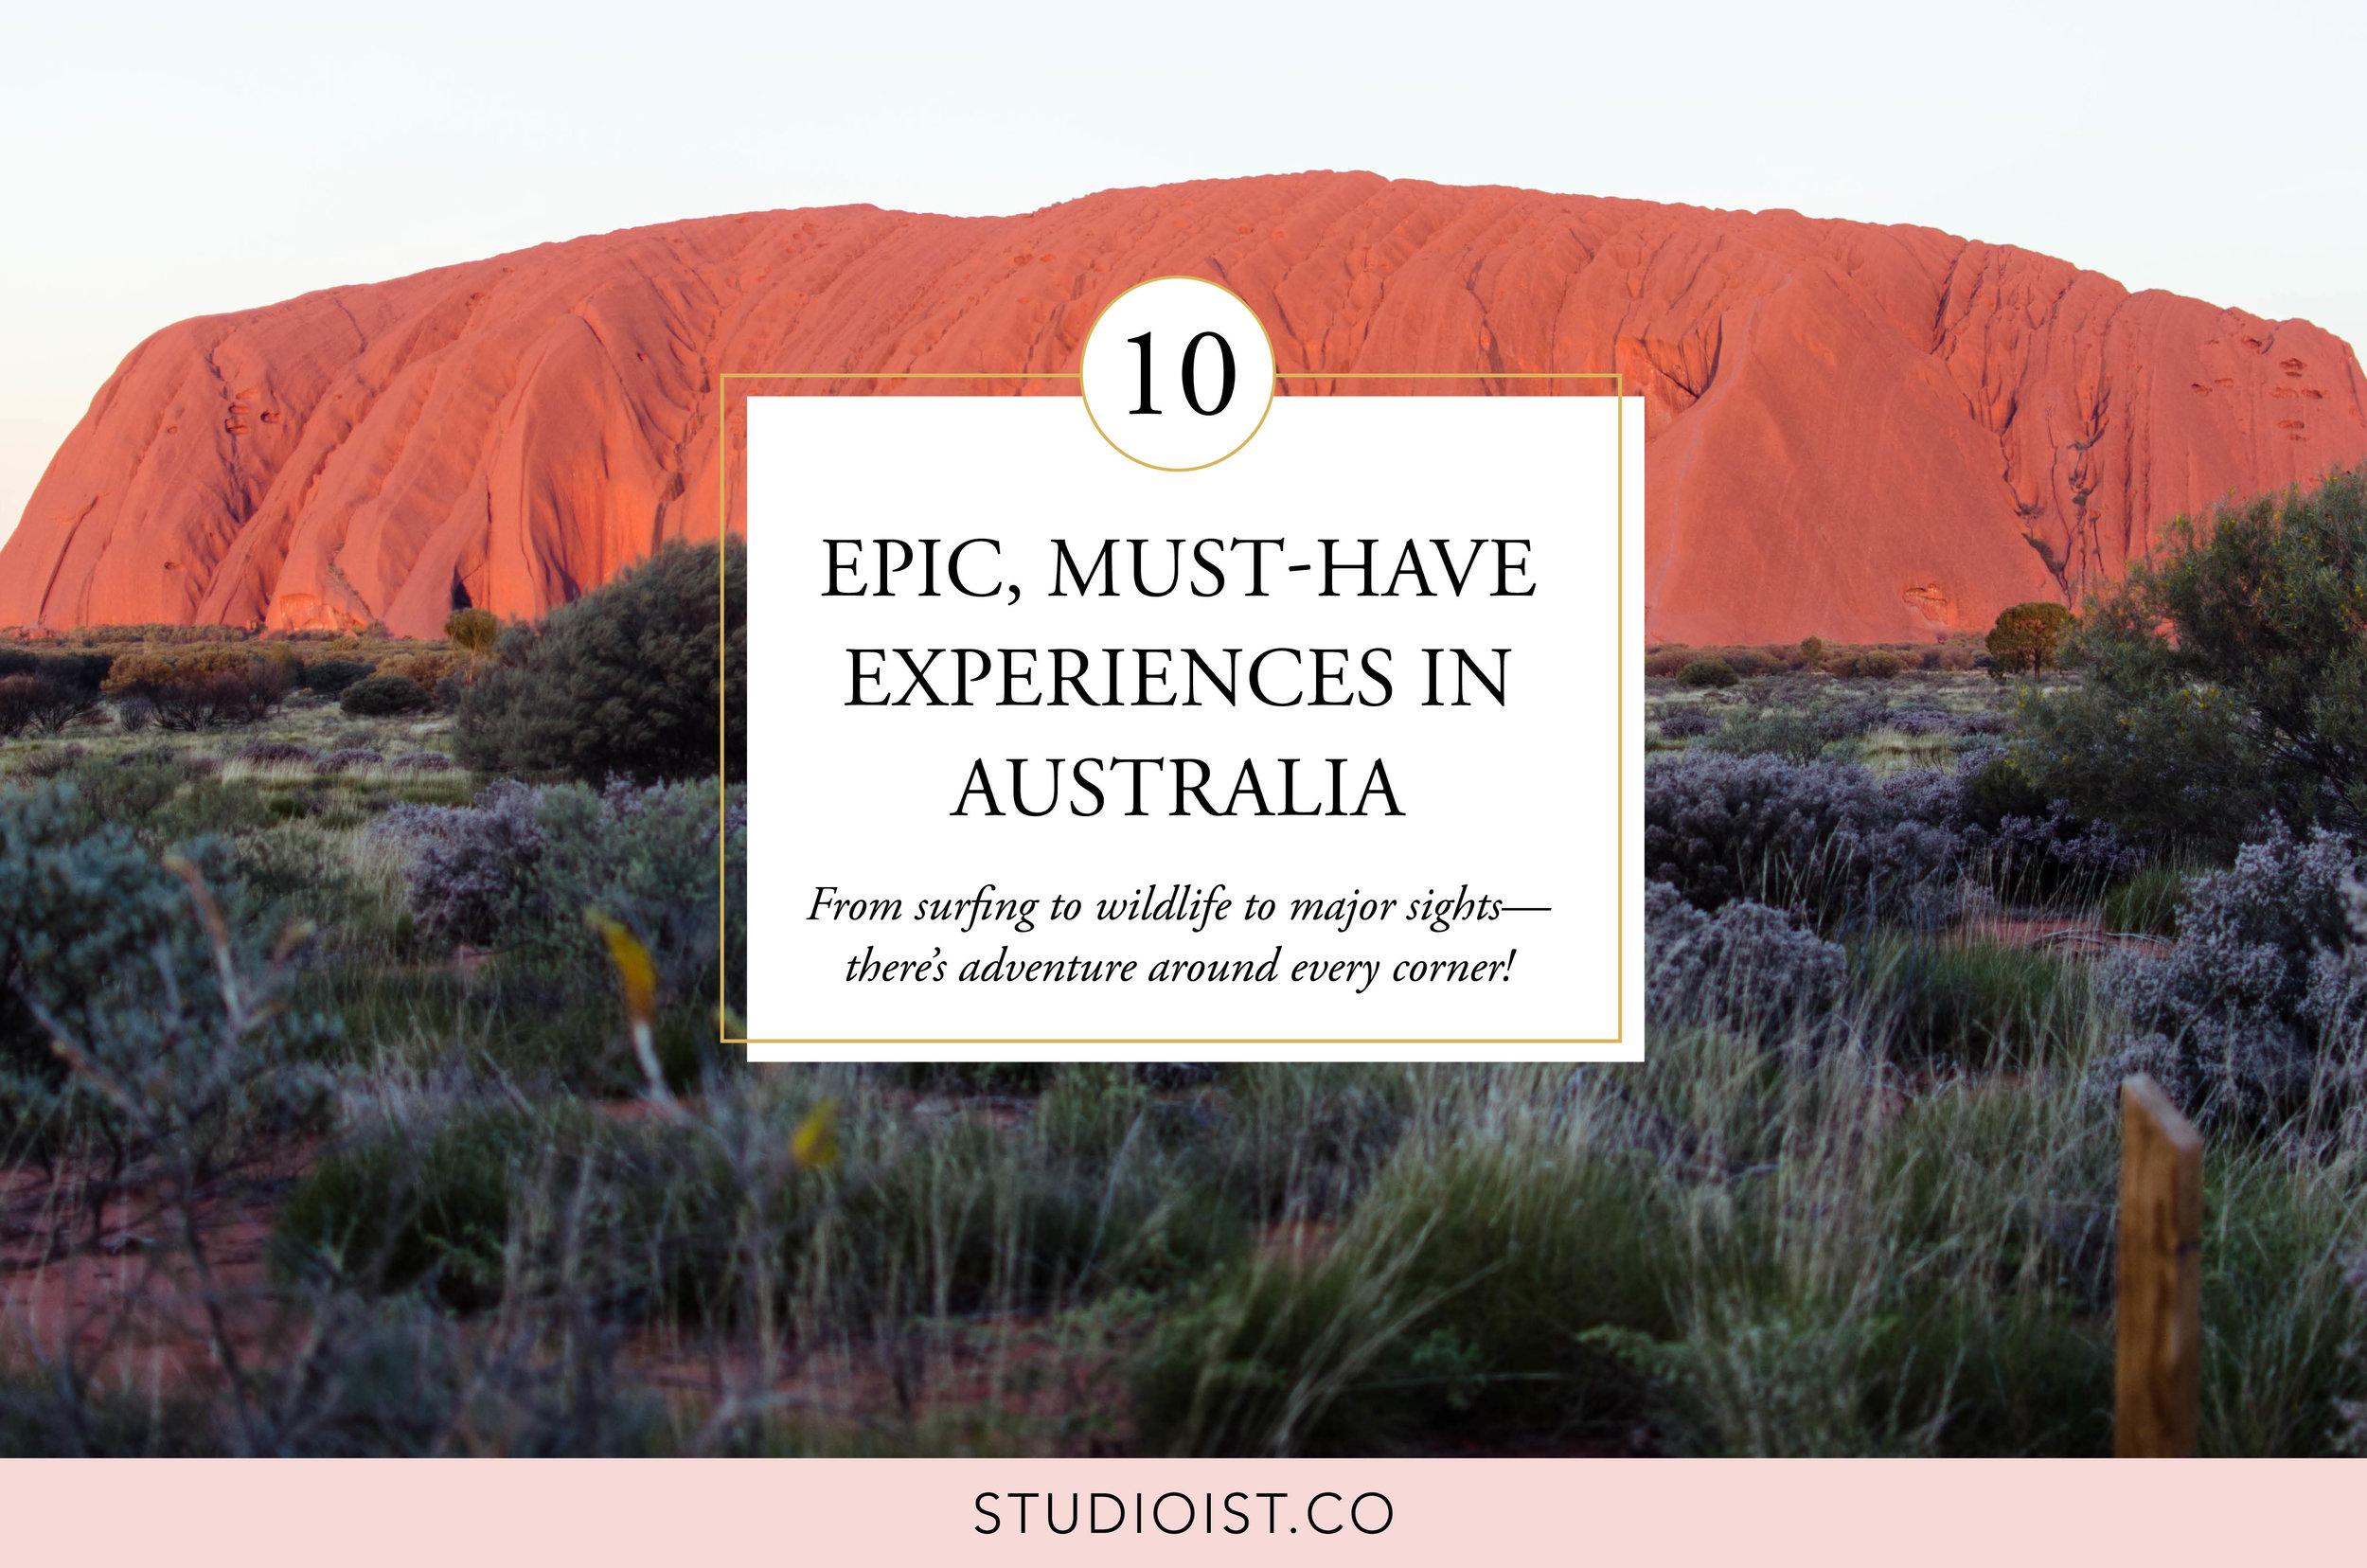 Studioist_Food Cover_Australian Experiences-small.jpg